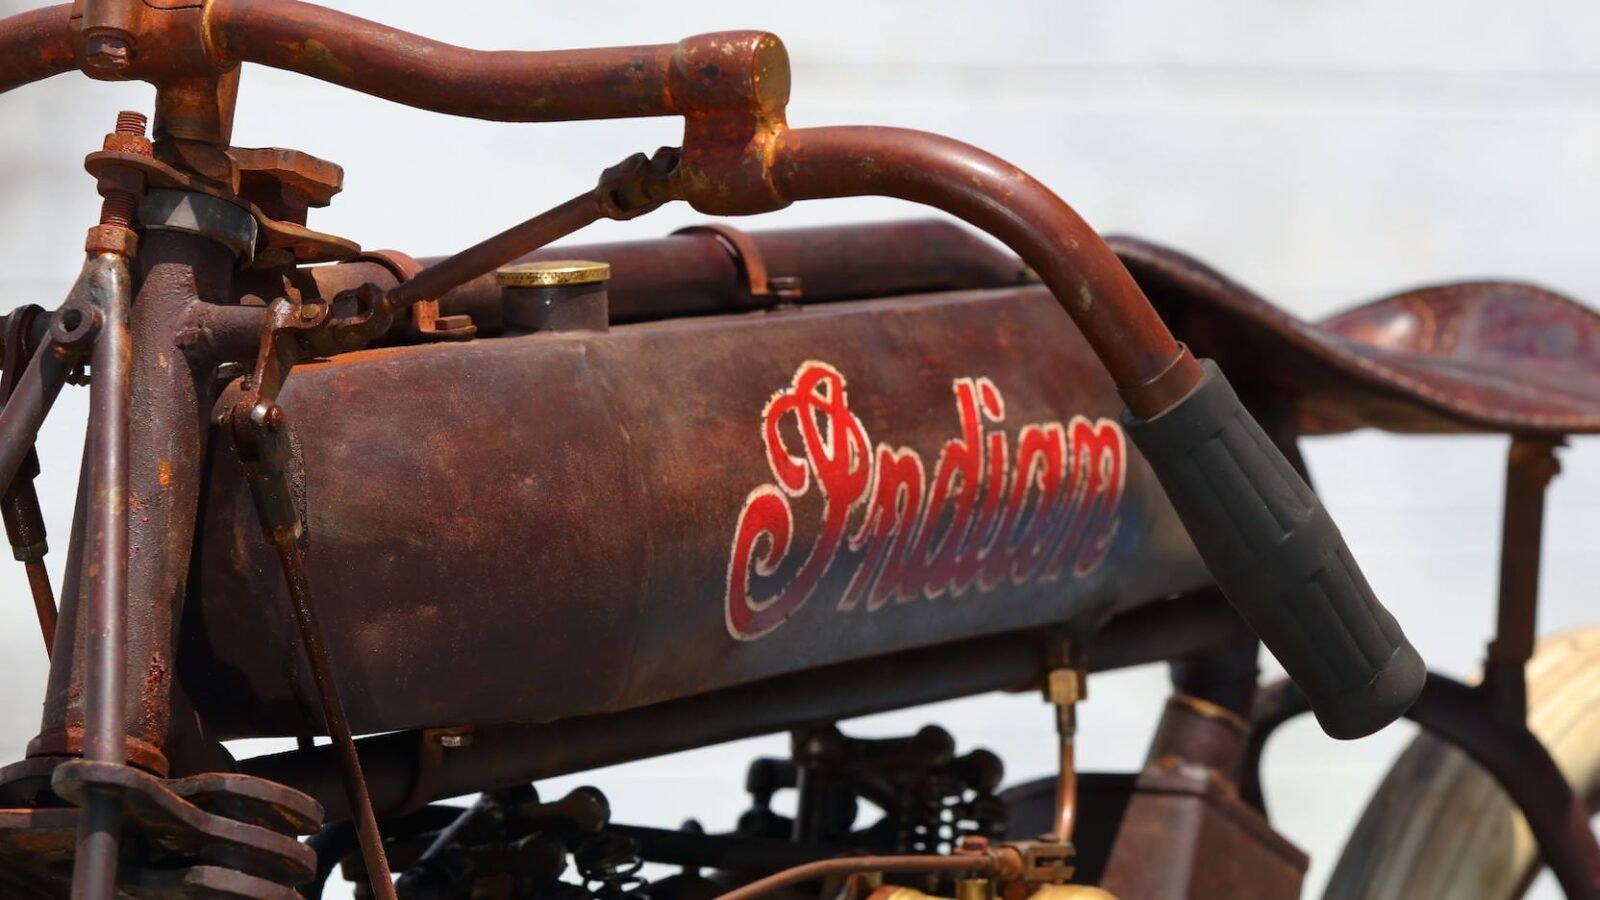 Uruguayan Garage Find - An $85,000 USD 1914 Indian 8-Valve Board Track Racer